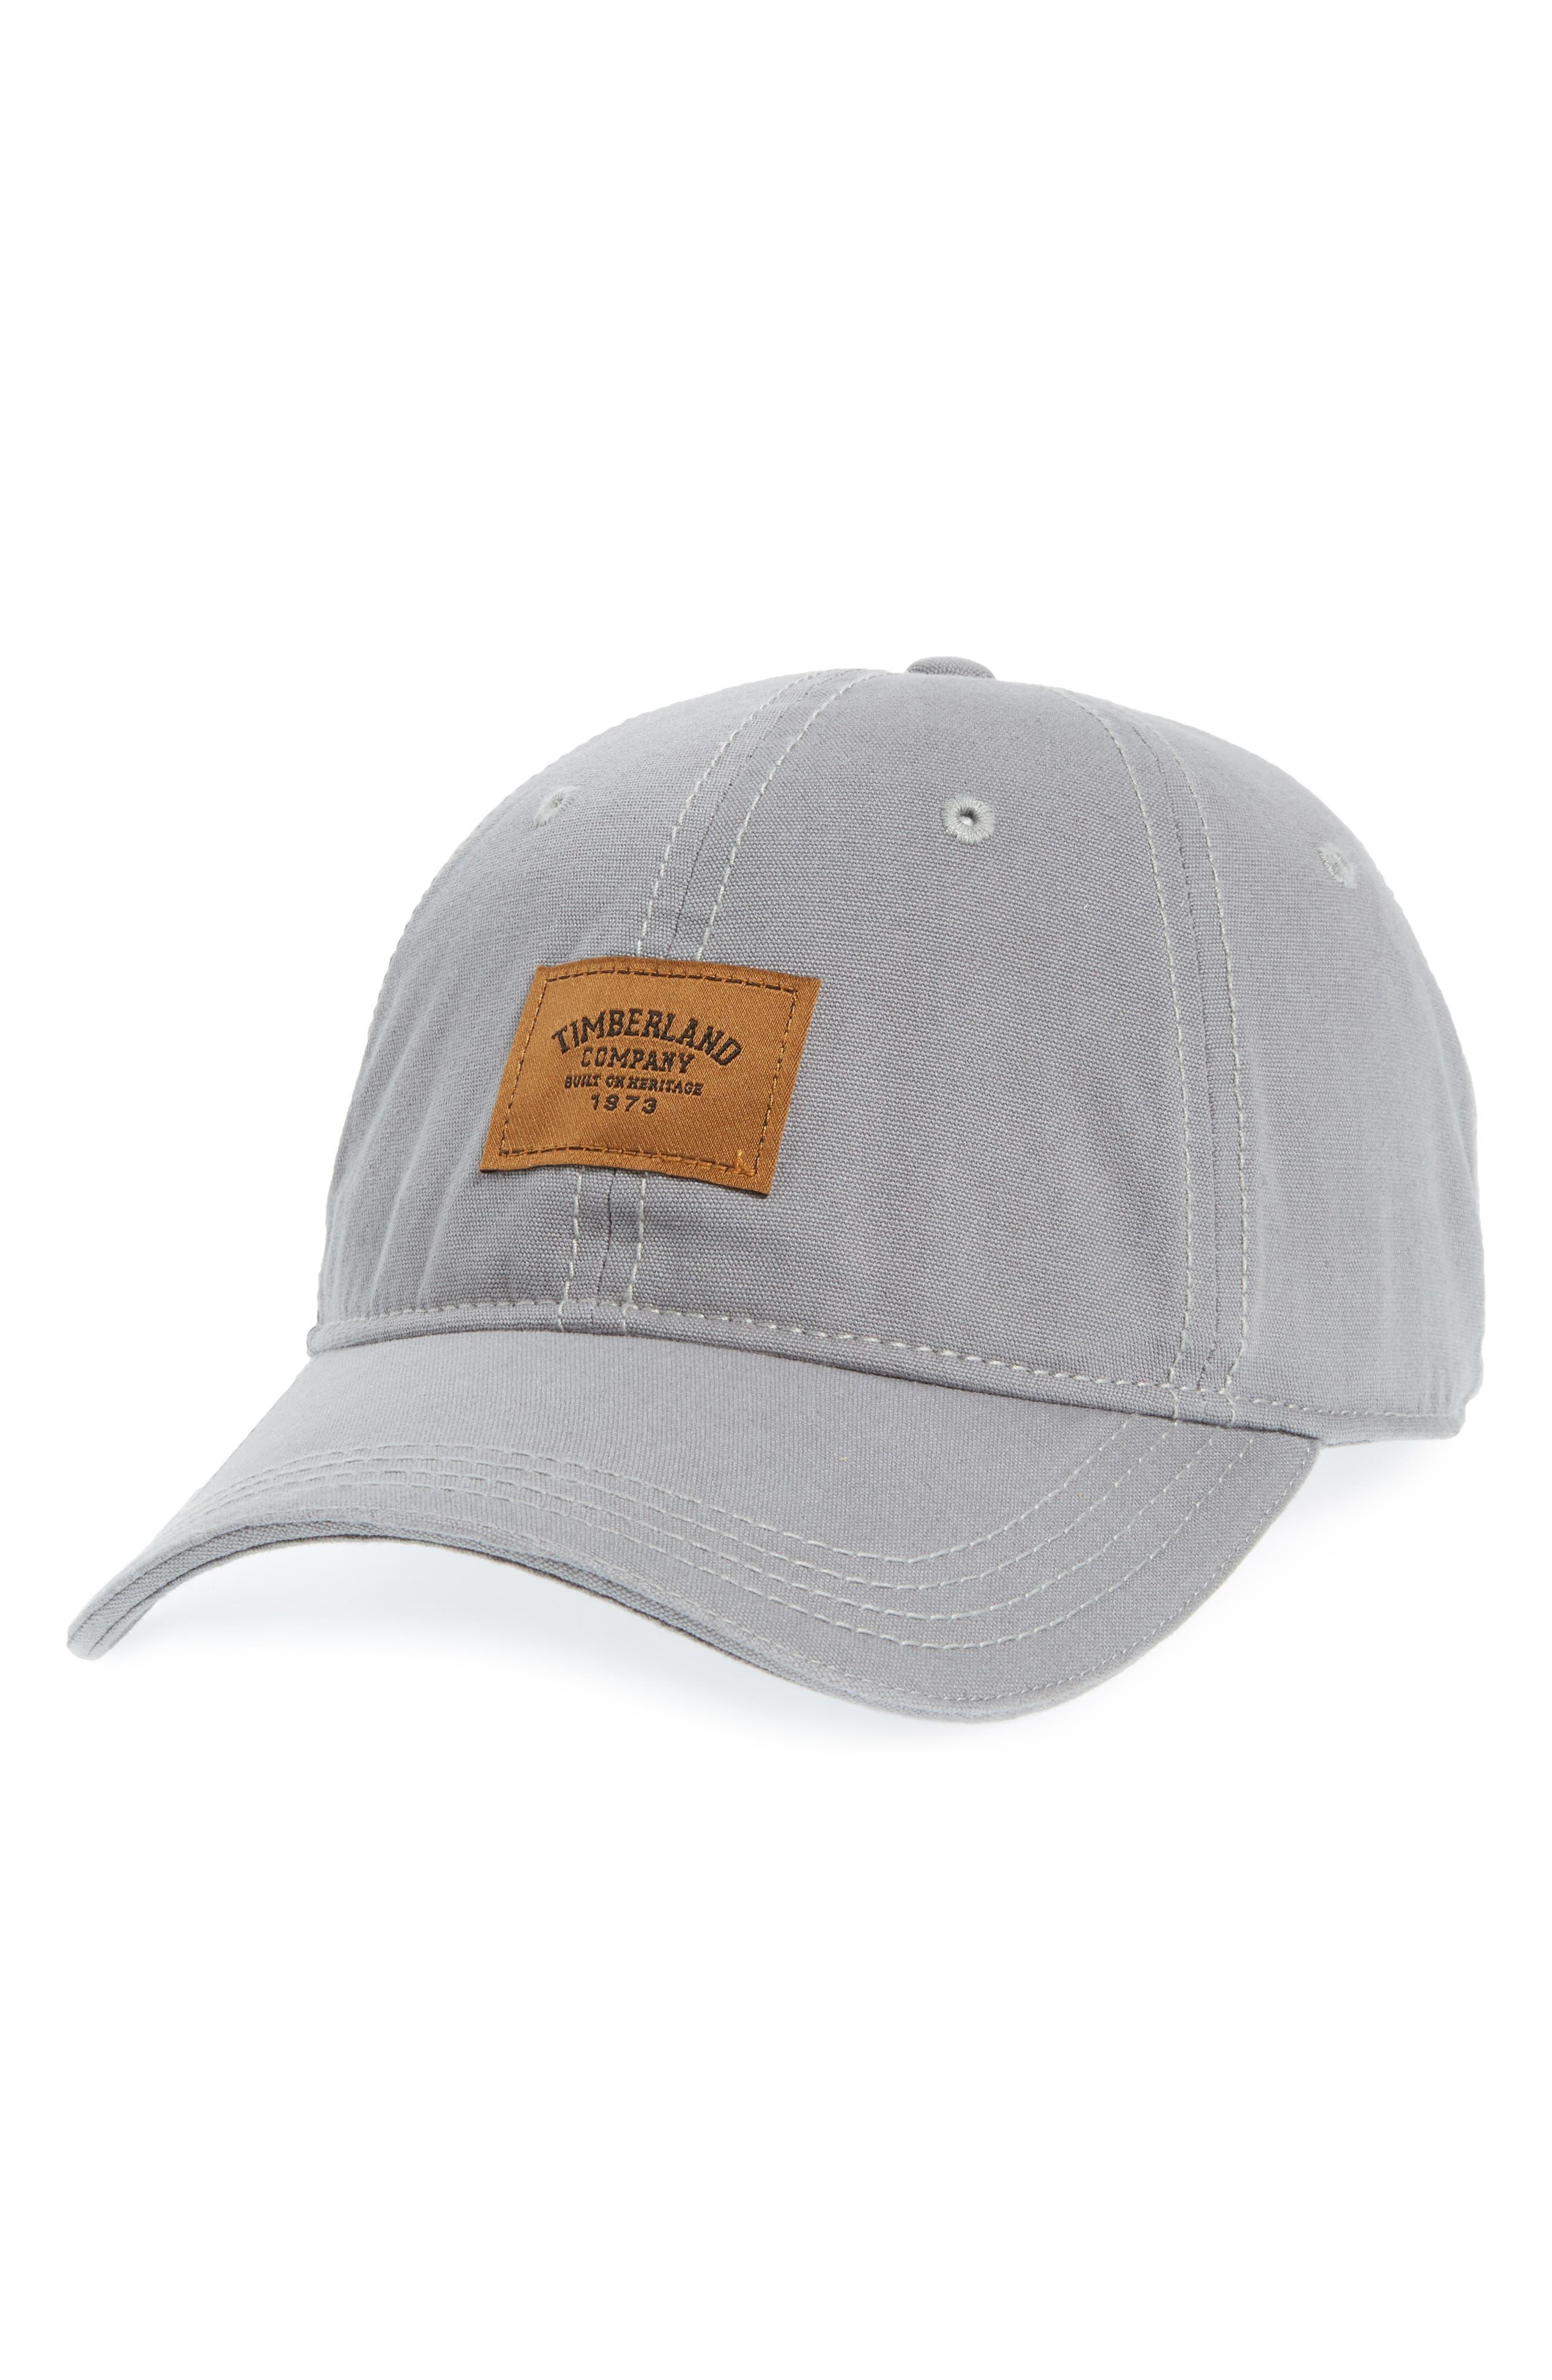 Timberland Sandown Baseball Cap